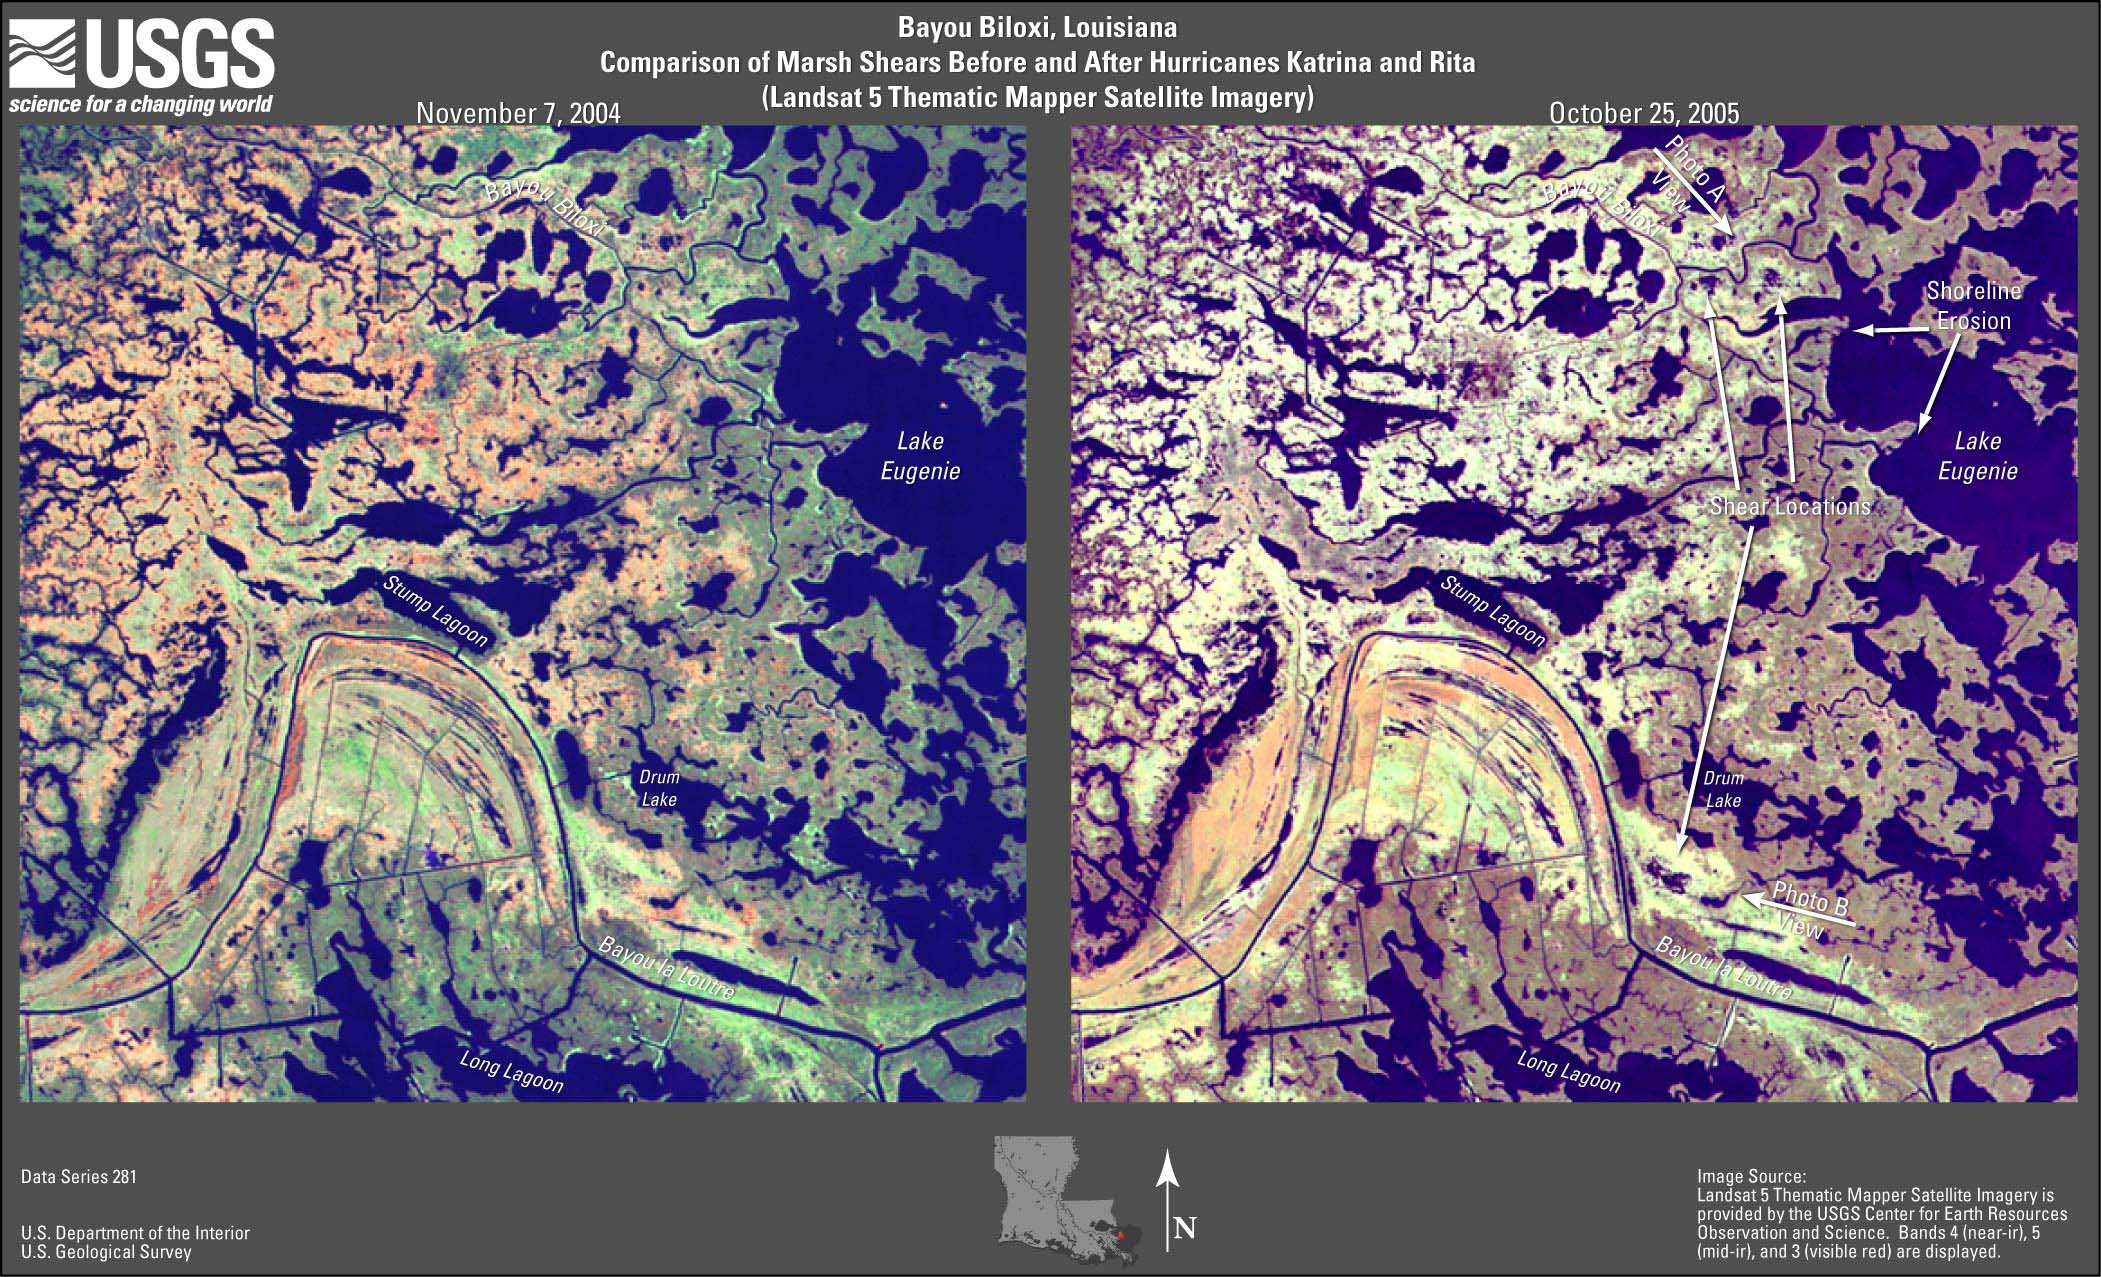 USGS Data Series 281: Satellite Images and Aerial